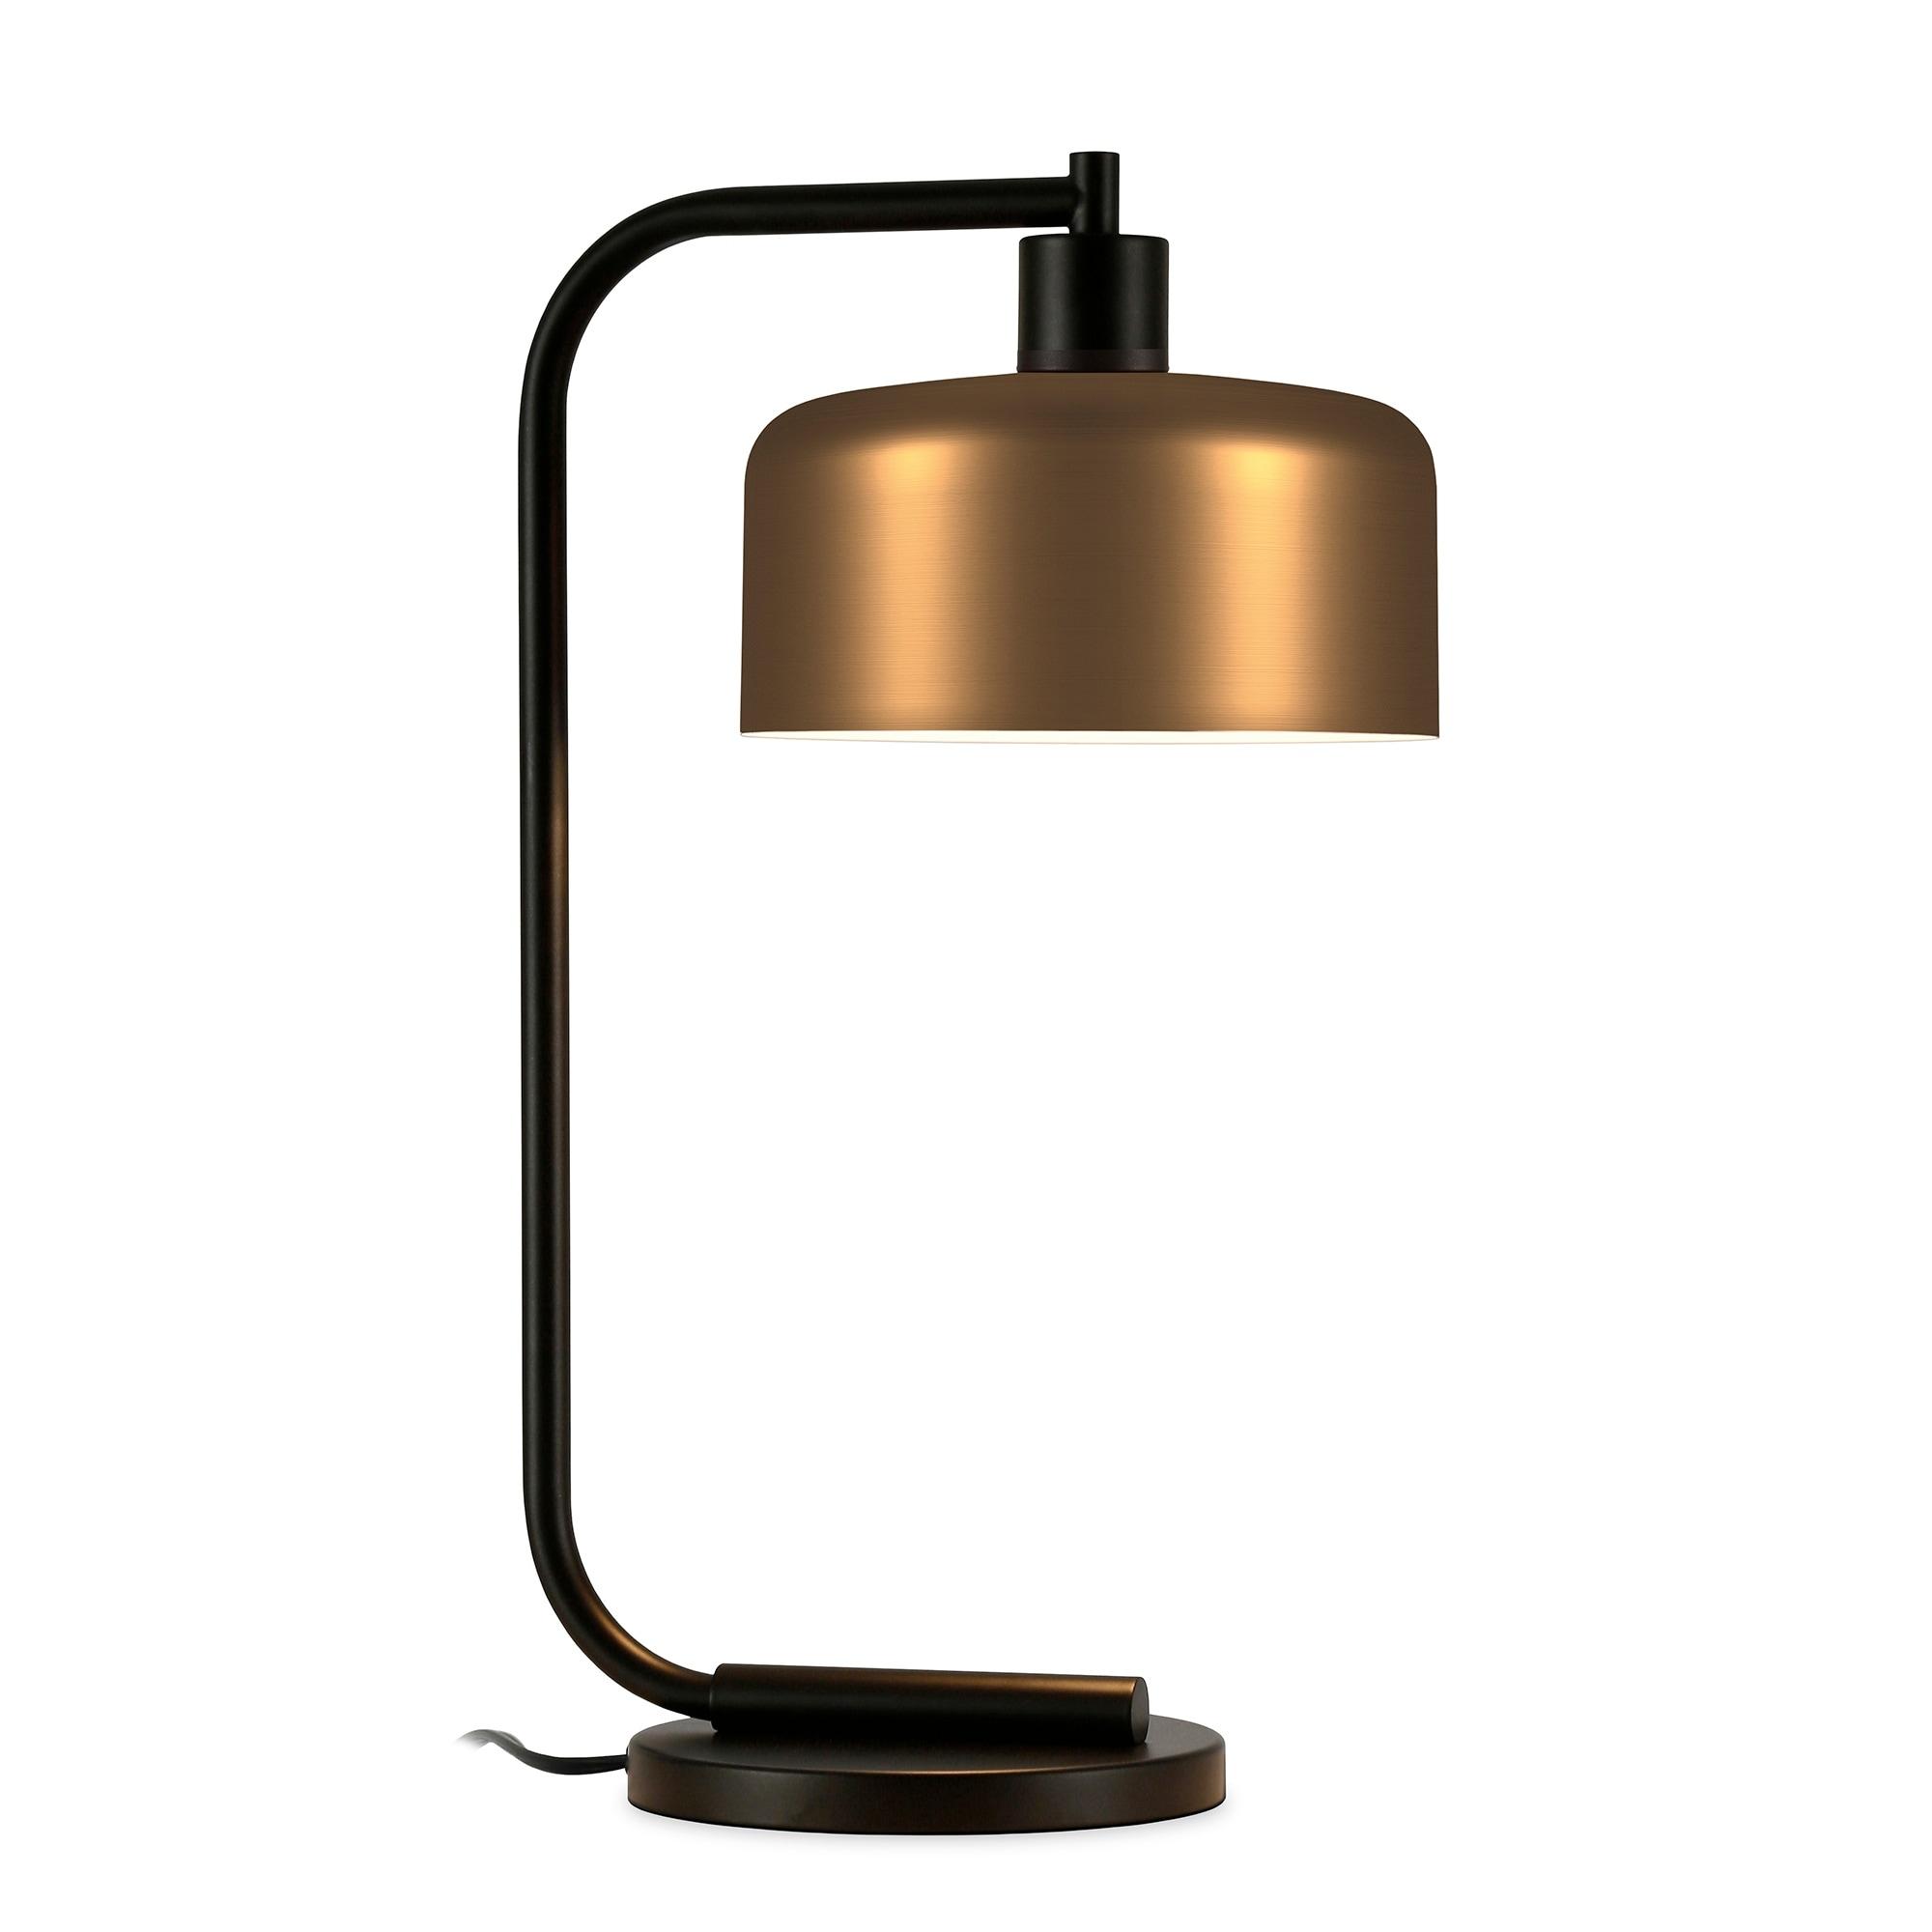 Carson Carrington Saevja Industrial Farmhouse Antique Brass Table Lamp Overstock 23145435 Brass Black Brass